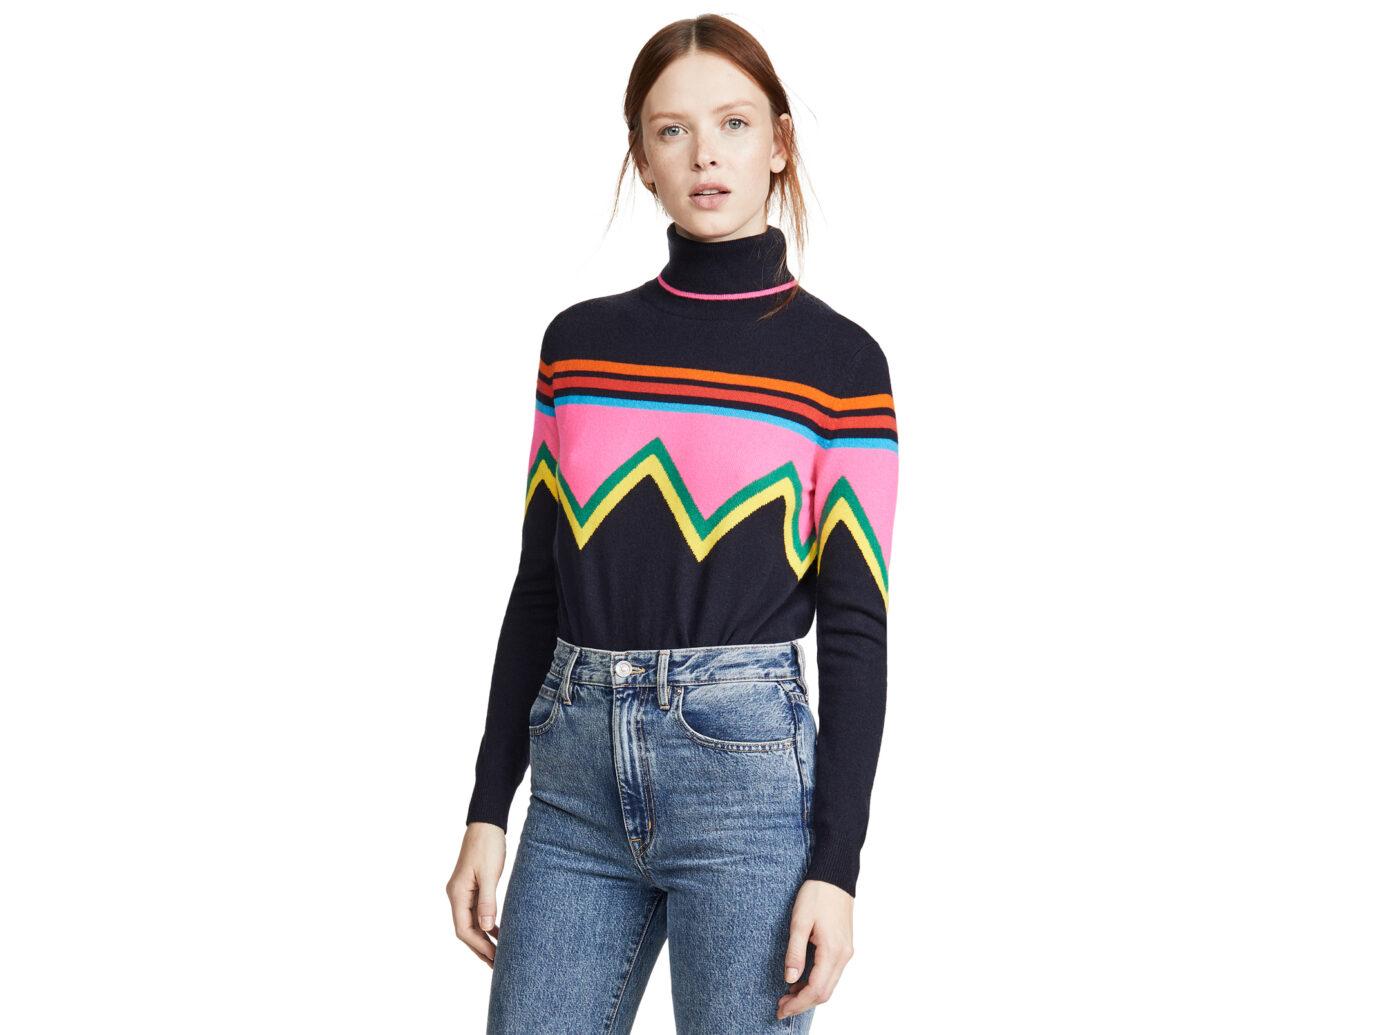 Chinti and Parker Ski Slope Sweater